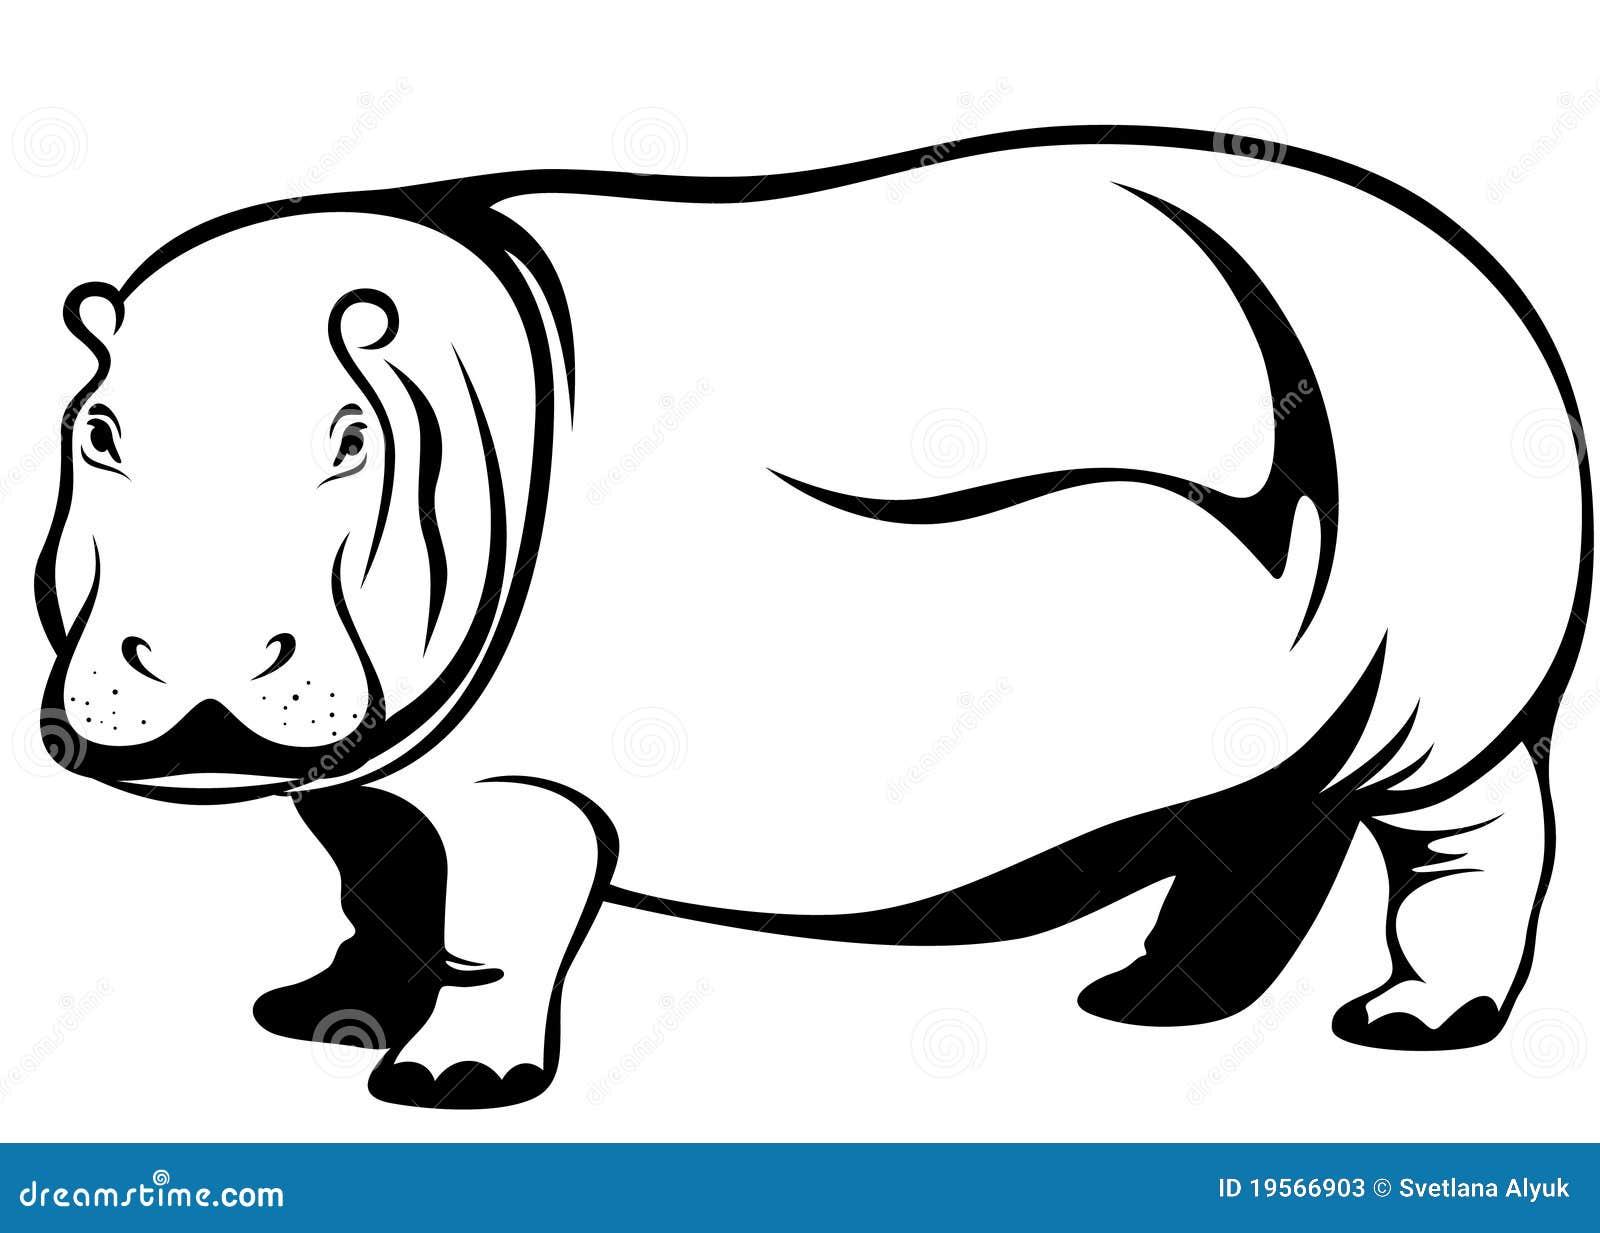 Cute hippopotamus illustration - black and white outline Hippopotamus Black And White